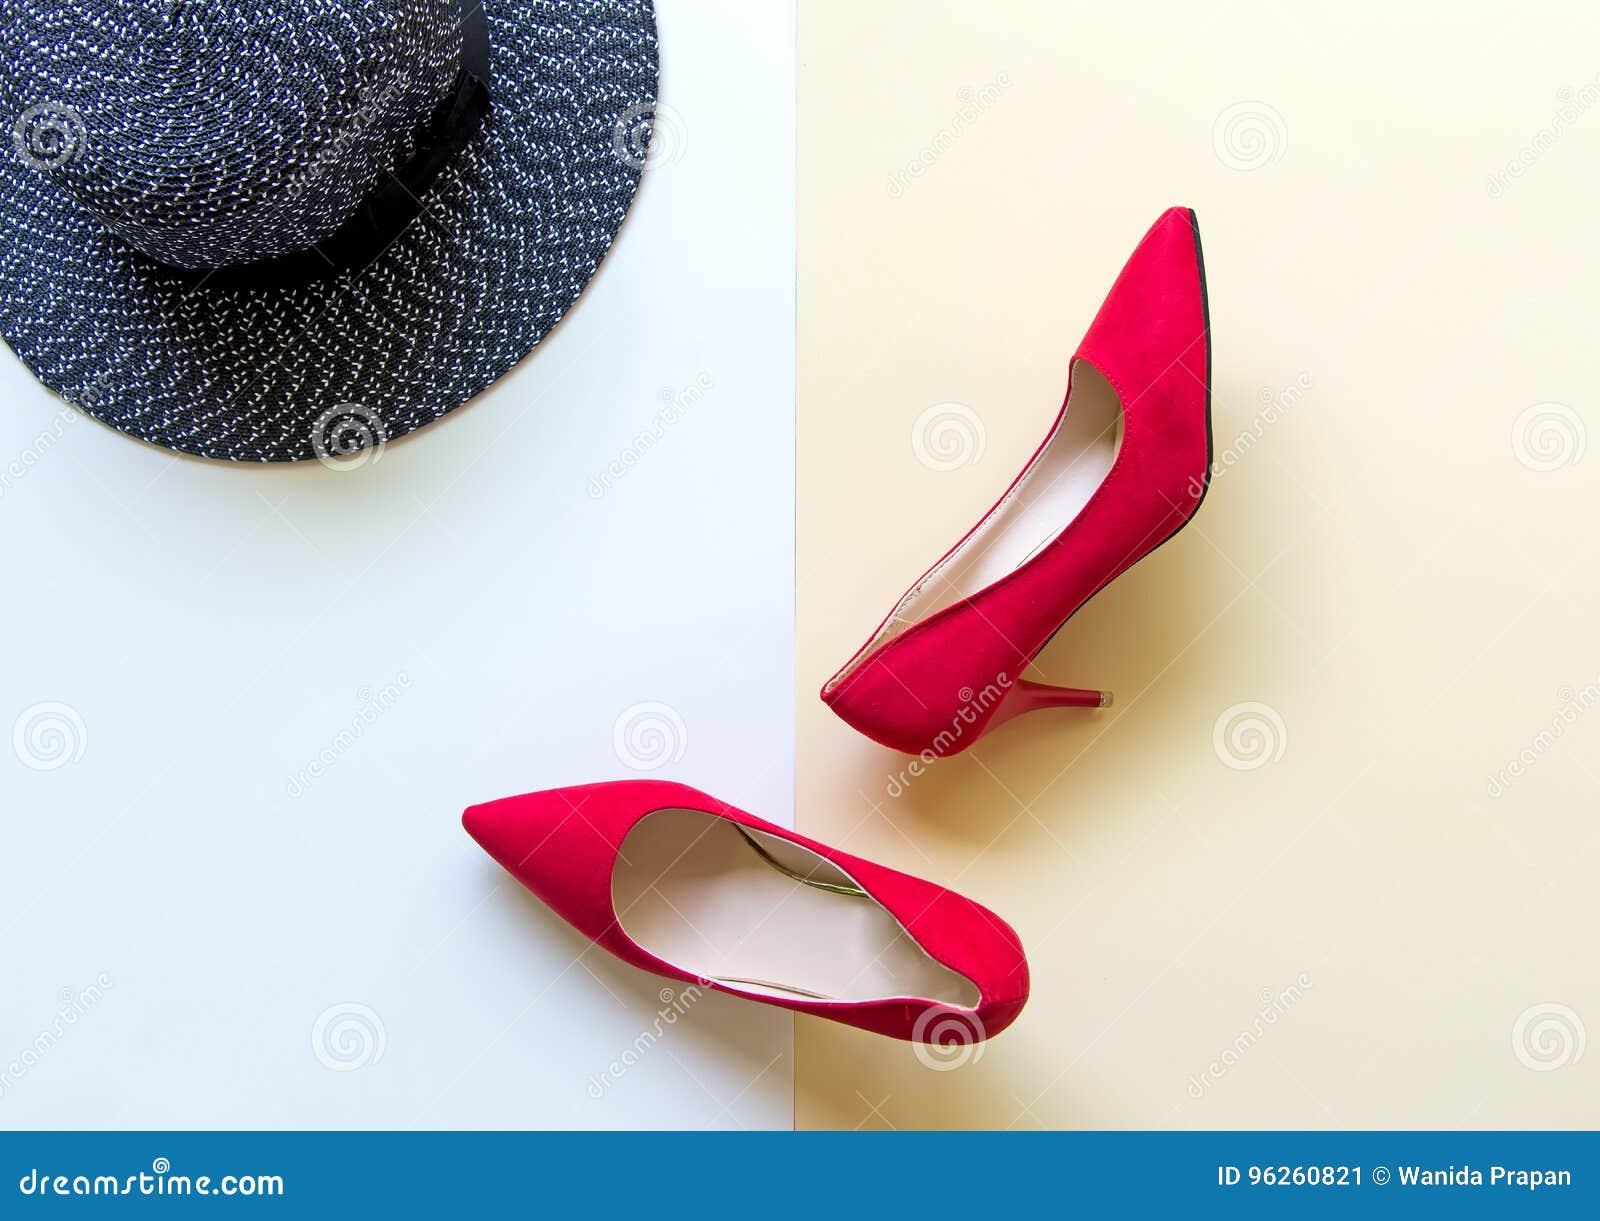 3c98b54142 Εξαρτήματα γυναικών μόδας καθορισμένα Καθιερώνοντα τη μόδα τακούνια  παπουτσιών μόδας κόκκινα